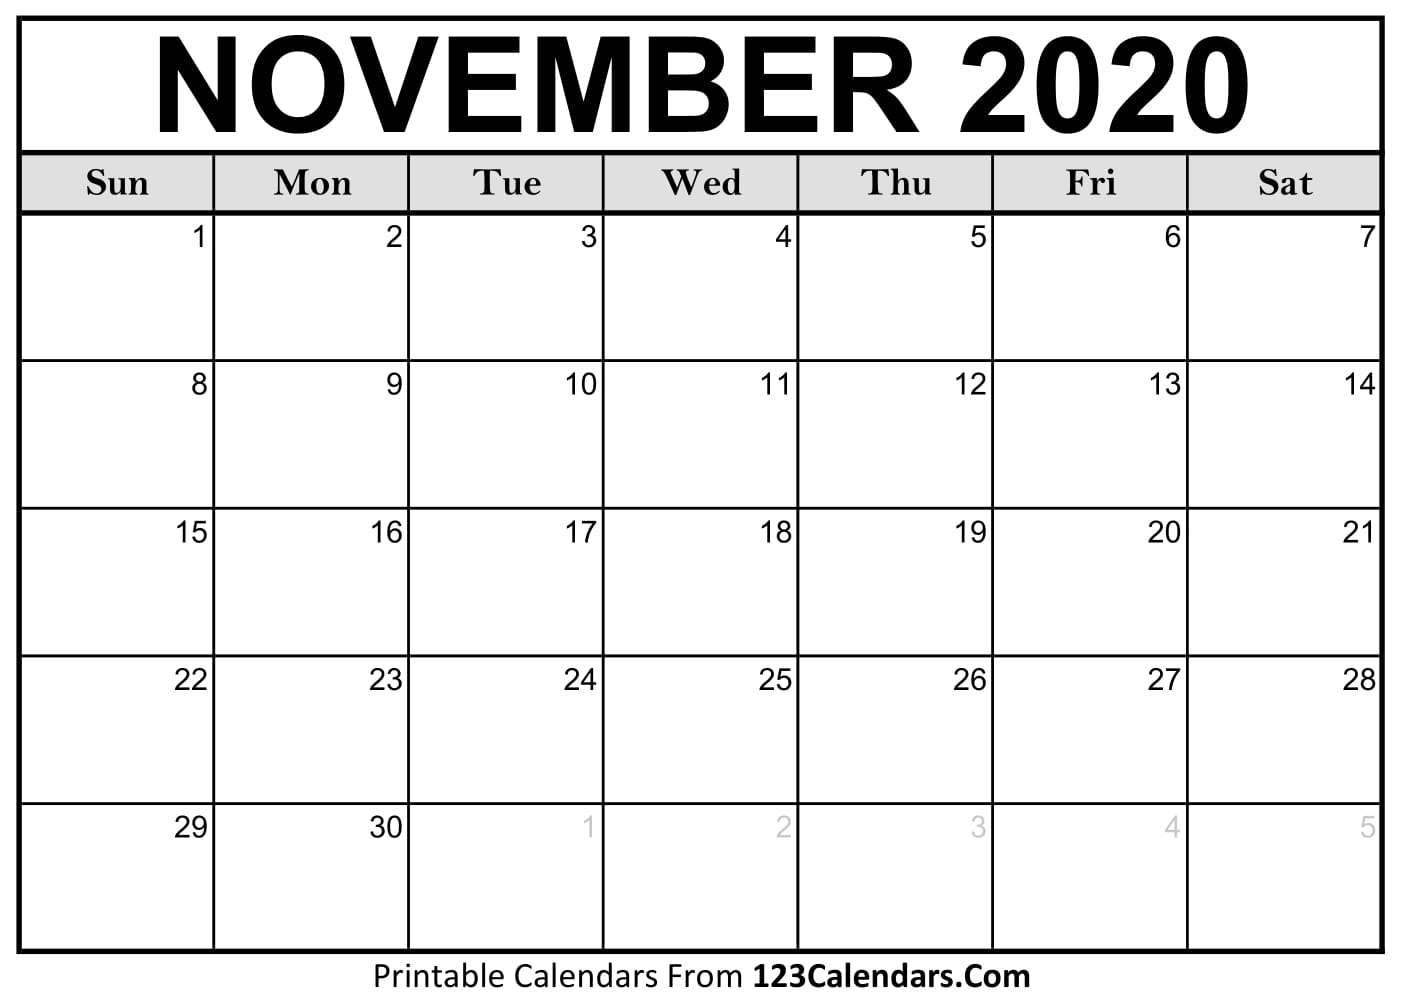 November 2020 Printable Calendar | 123Calendars